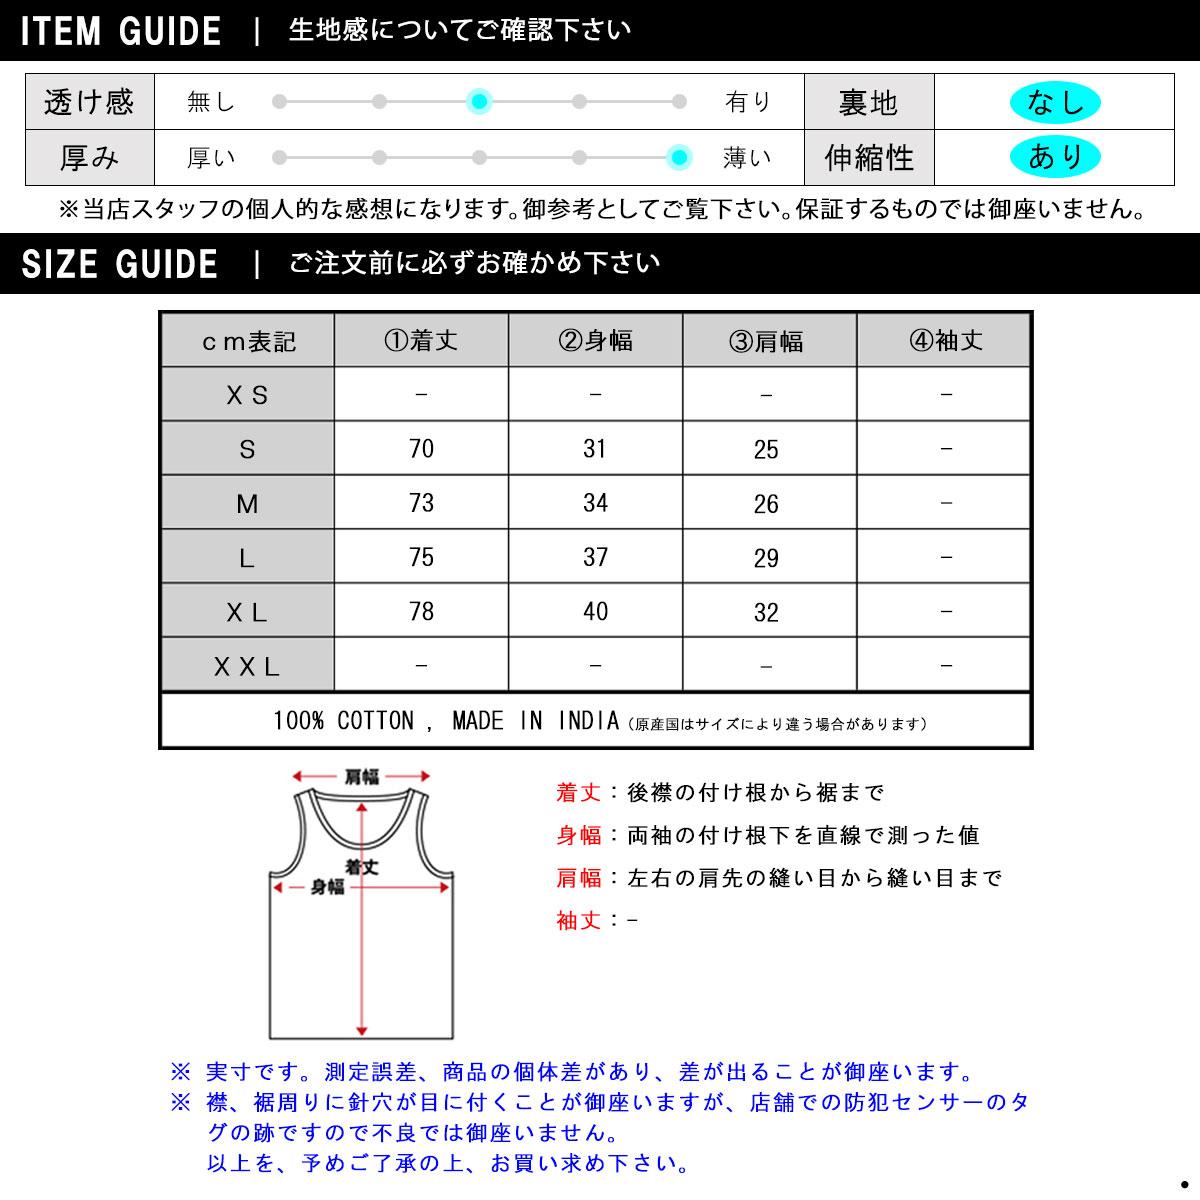 20%OFFセール 【販売期間 1/23 16...の紹介画像3